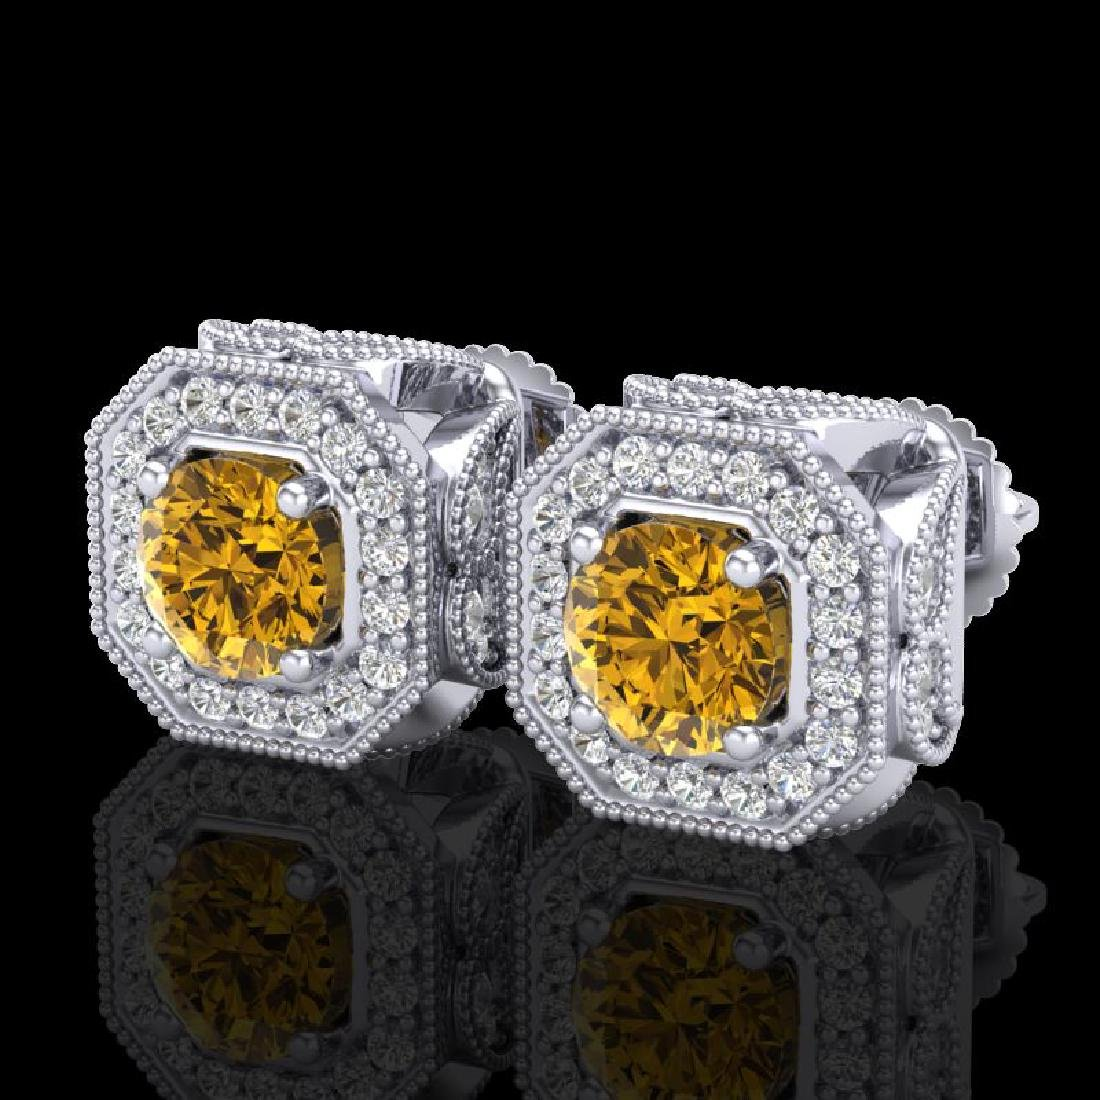 2.75 CTW Intense Fancy Yellow Diamond Art Deco Stud